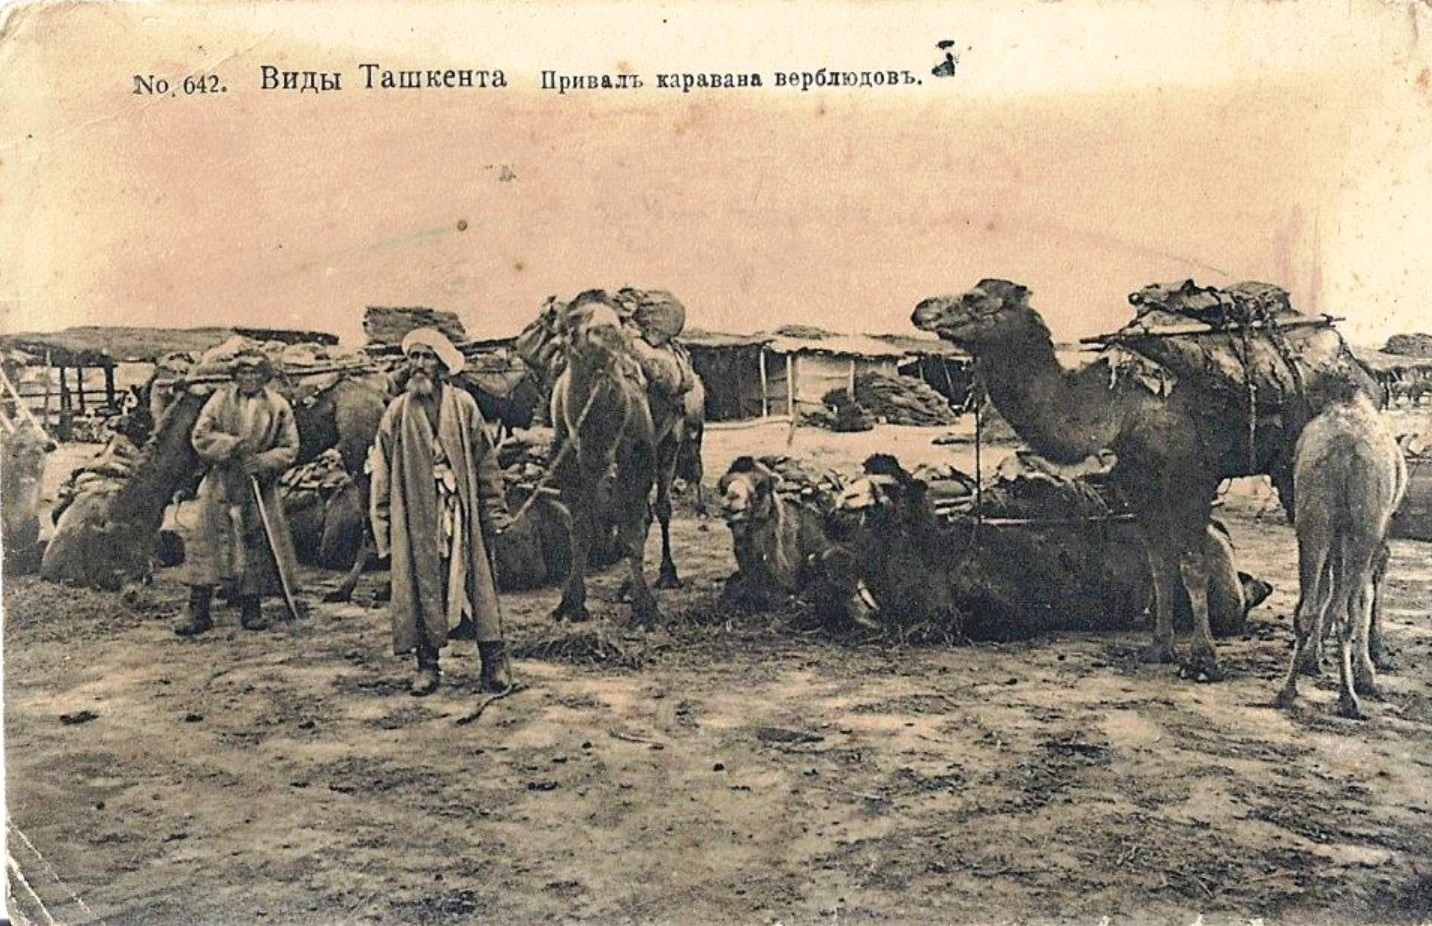 Окрестности Ташкента. Привал каравана верблюдов